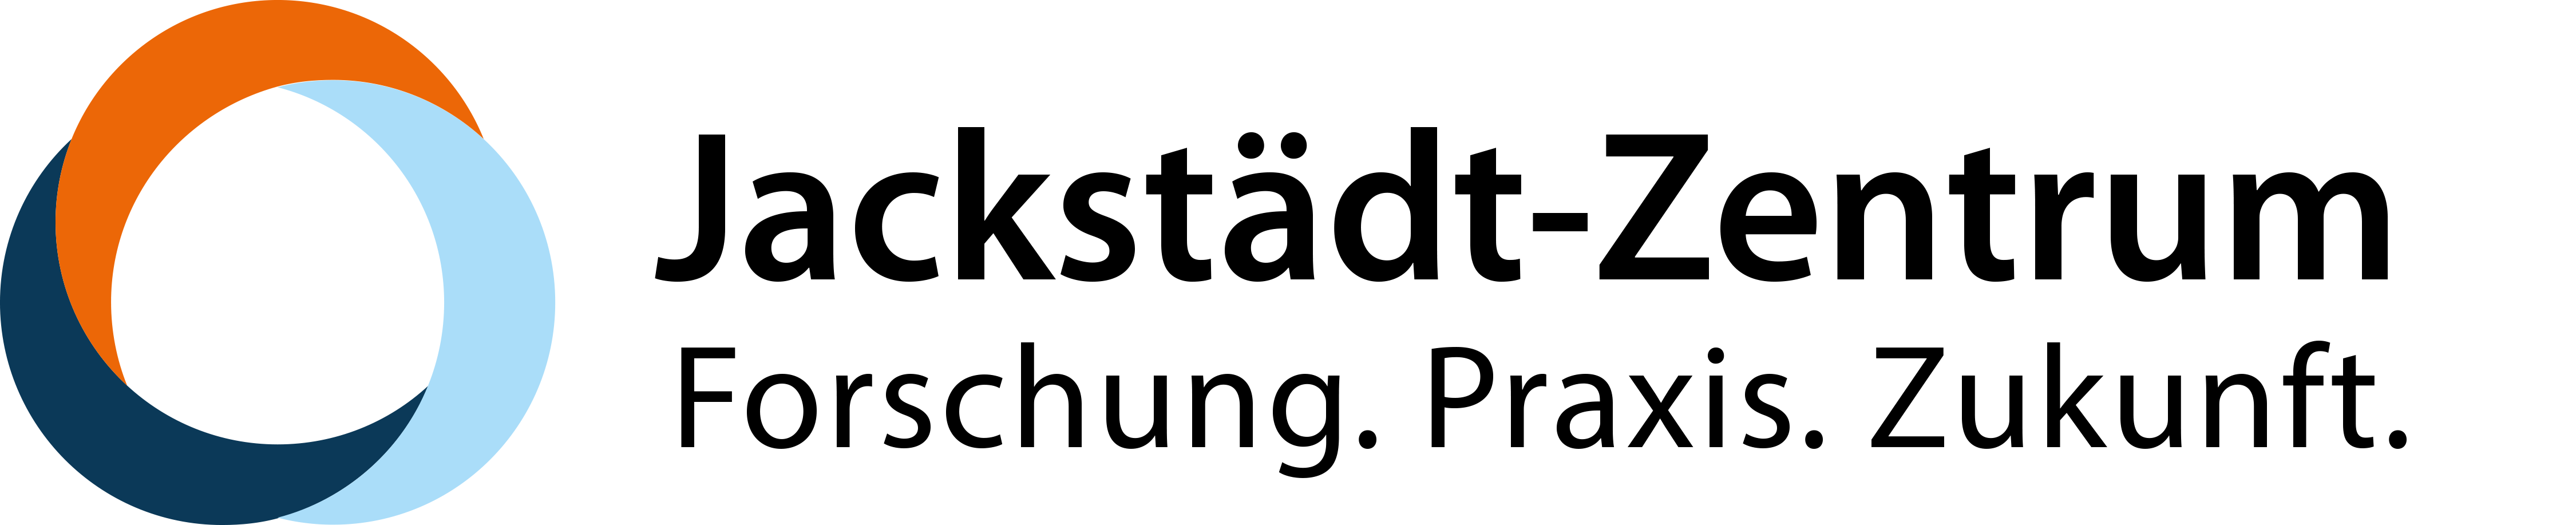 Jackstädt-Zentrum